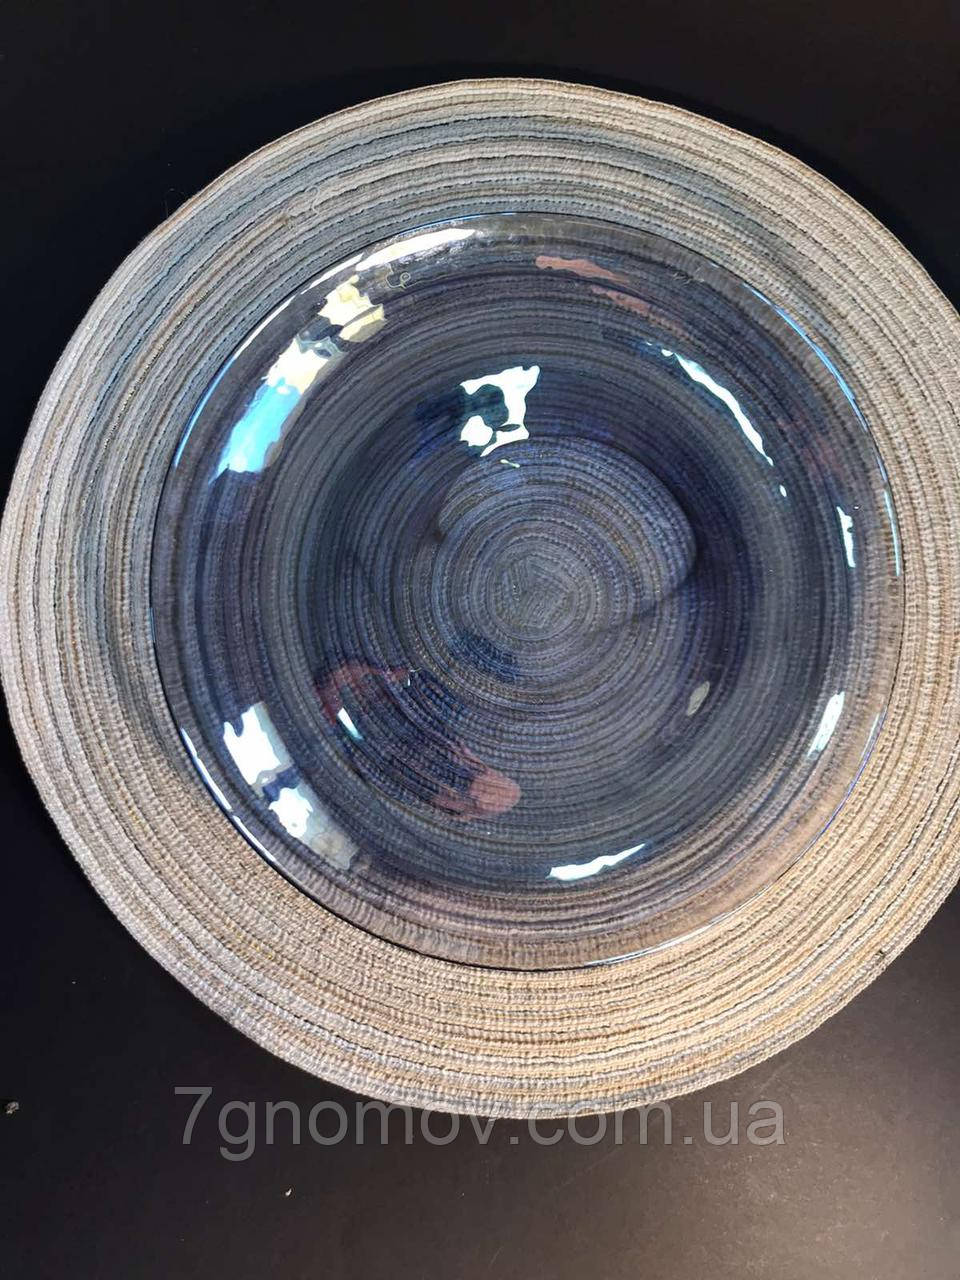 Набор 6 стеклянных обеденных тарелок прозрачно-синий Океан 27 см арт. 16112-14 - фото 2